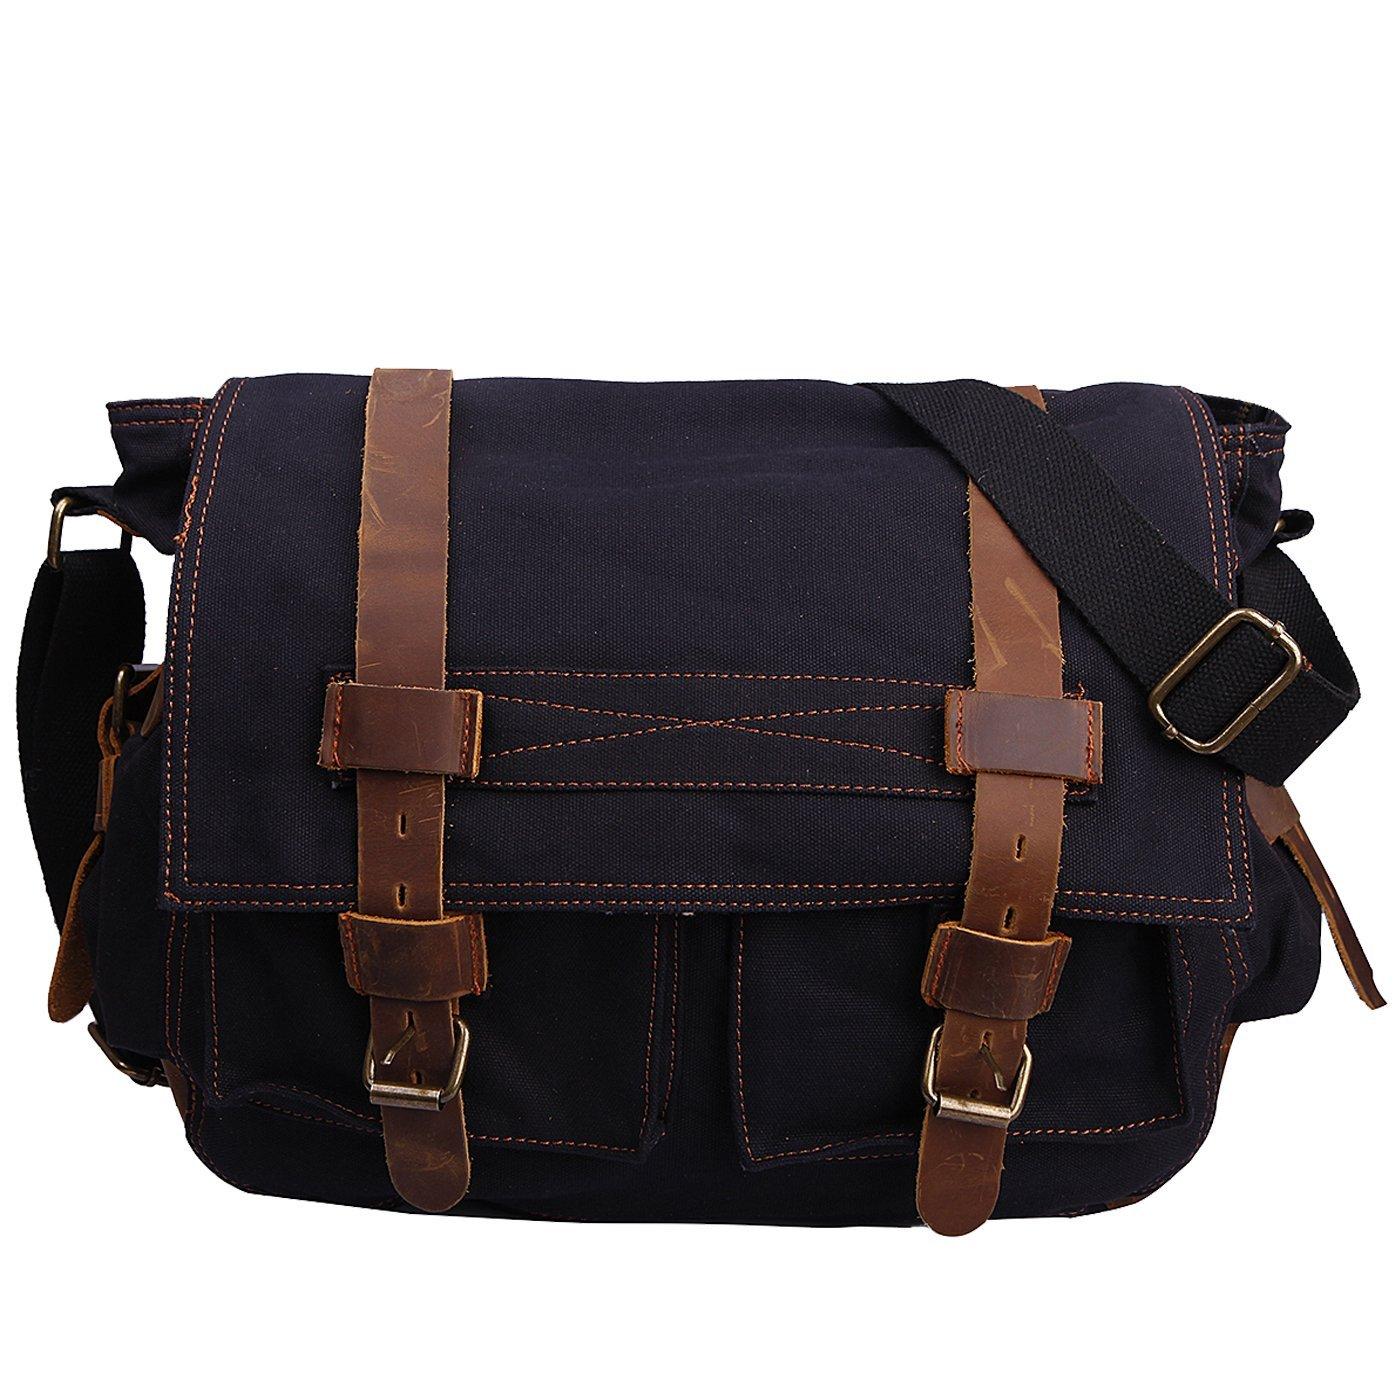 HDE Vintage Canvas Messenger Bag Leather Military Tactical Style Travel Shoulder Field Bag fits 15 Inch Laptop